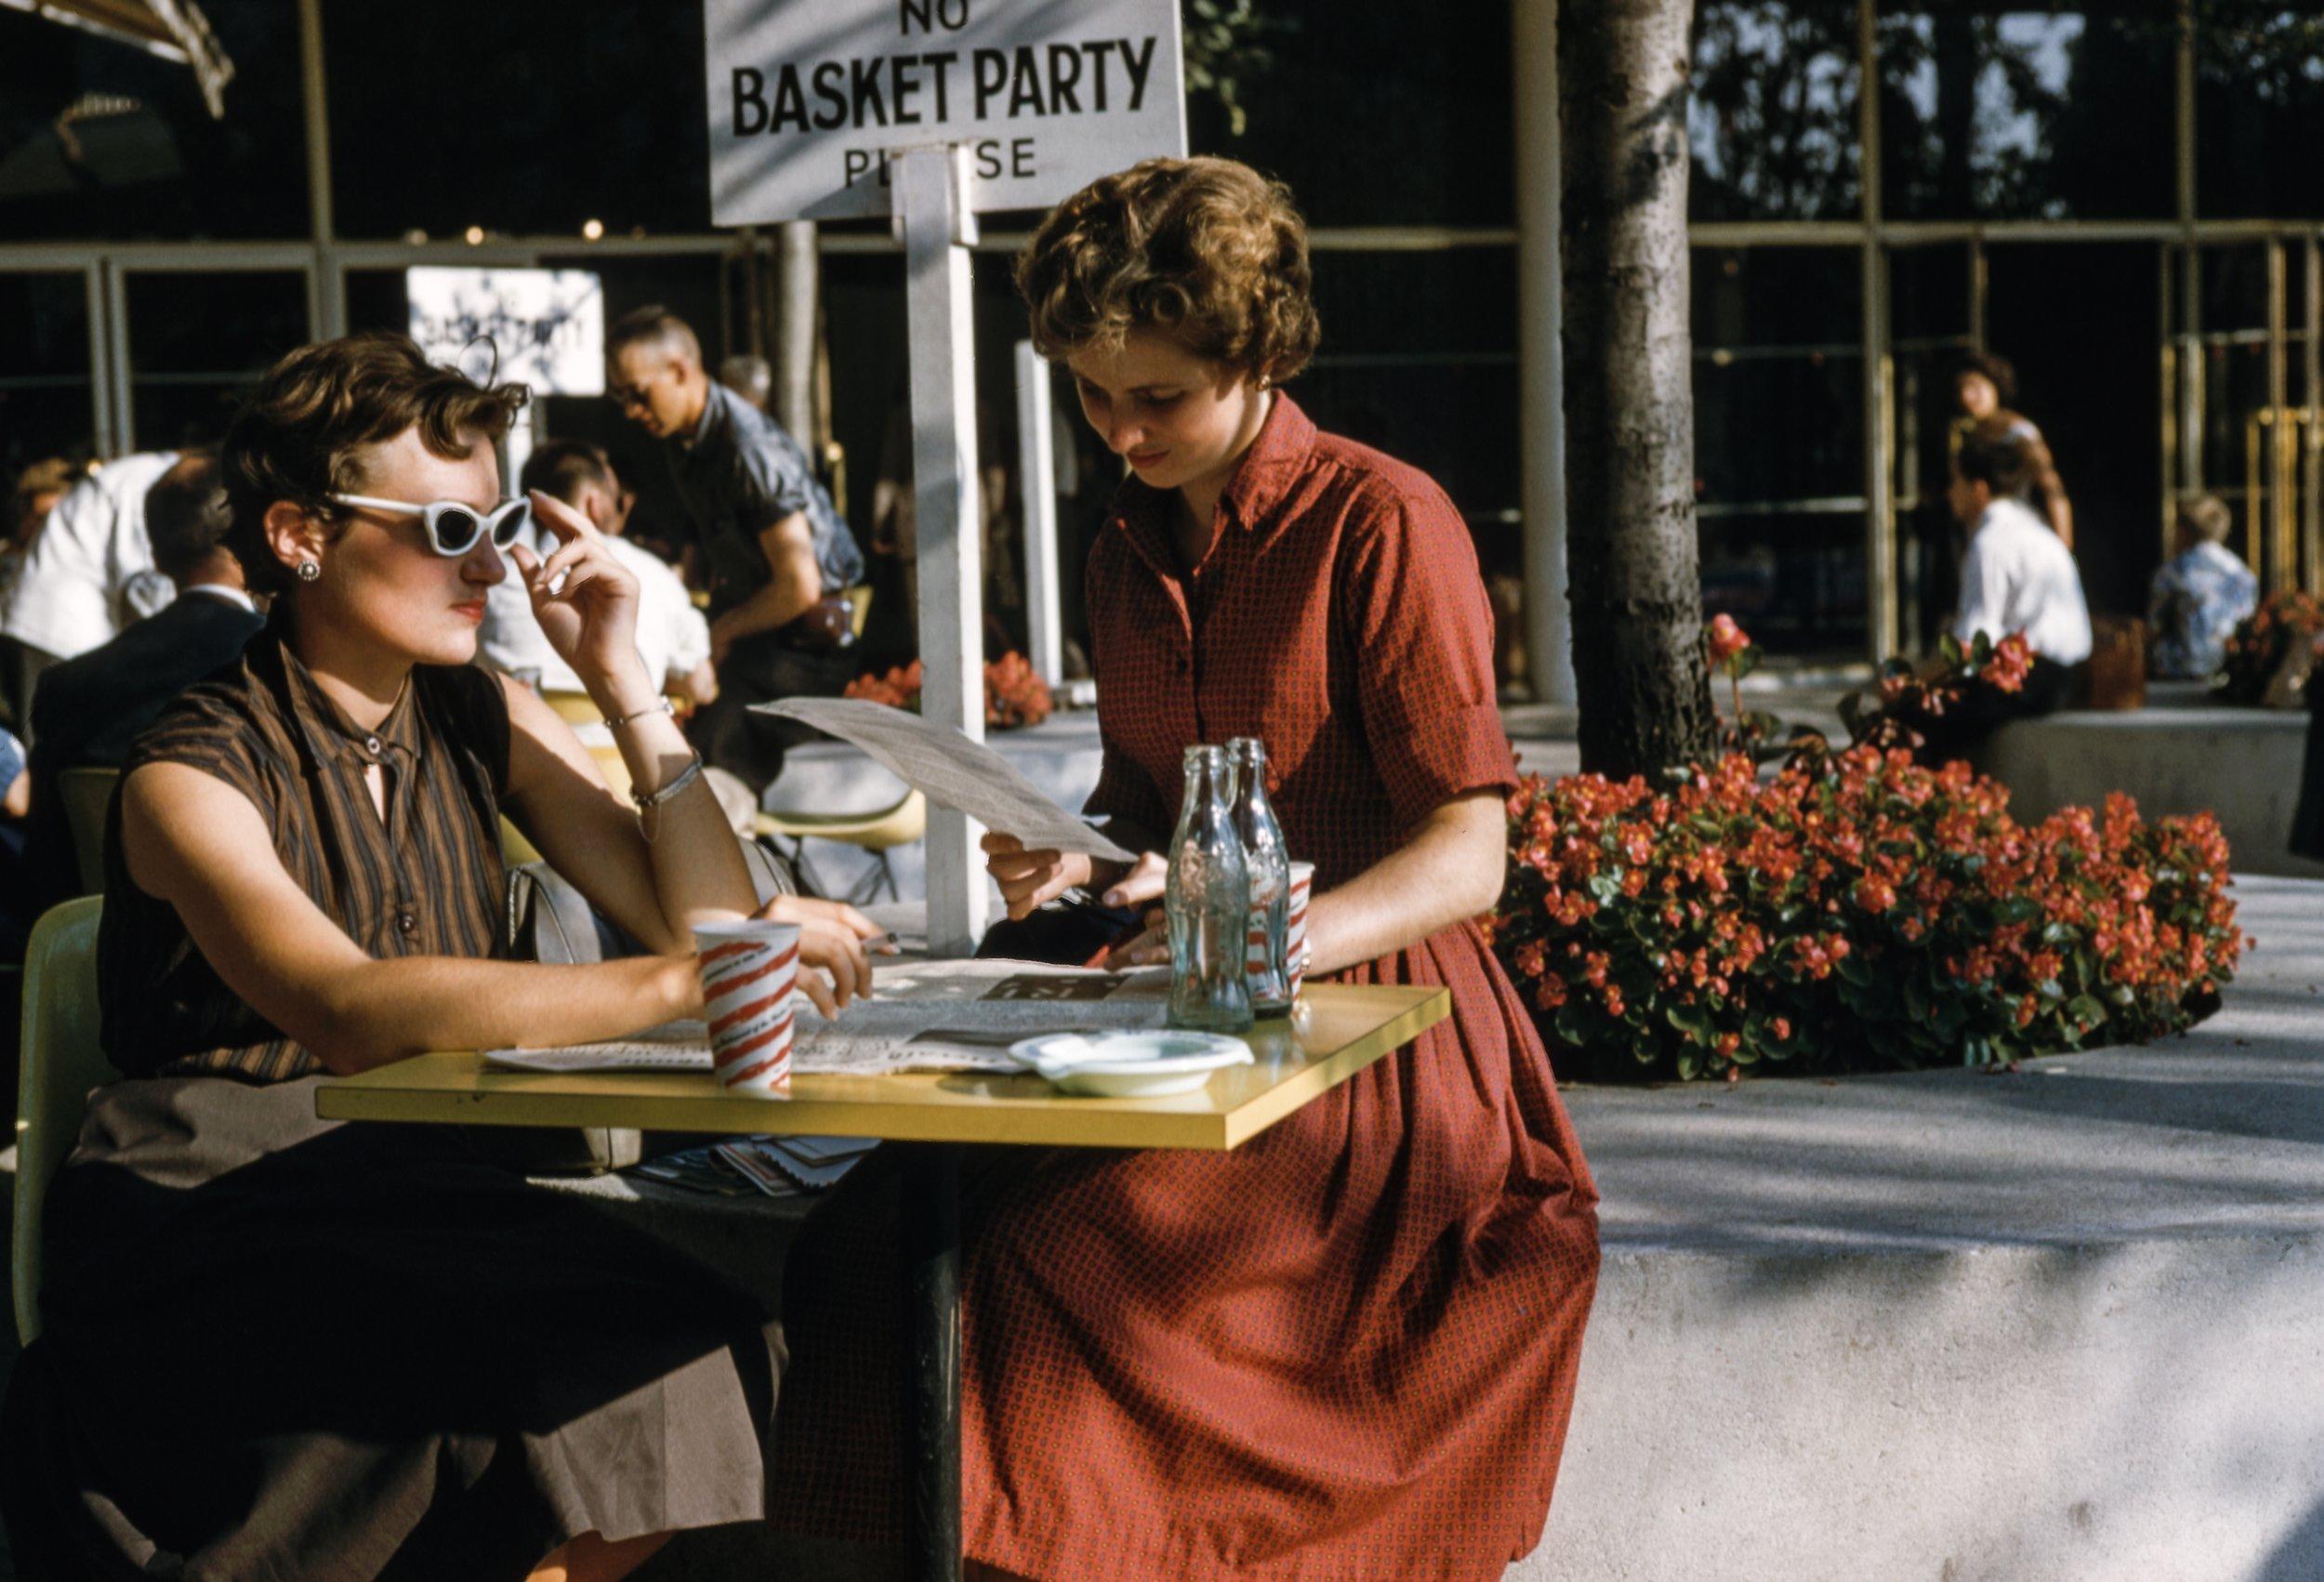 50s. 60s, vintage, america